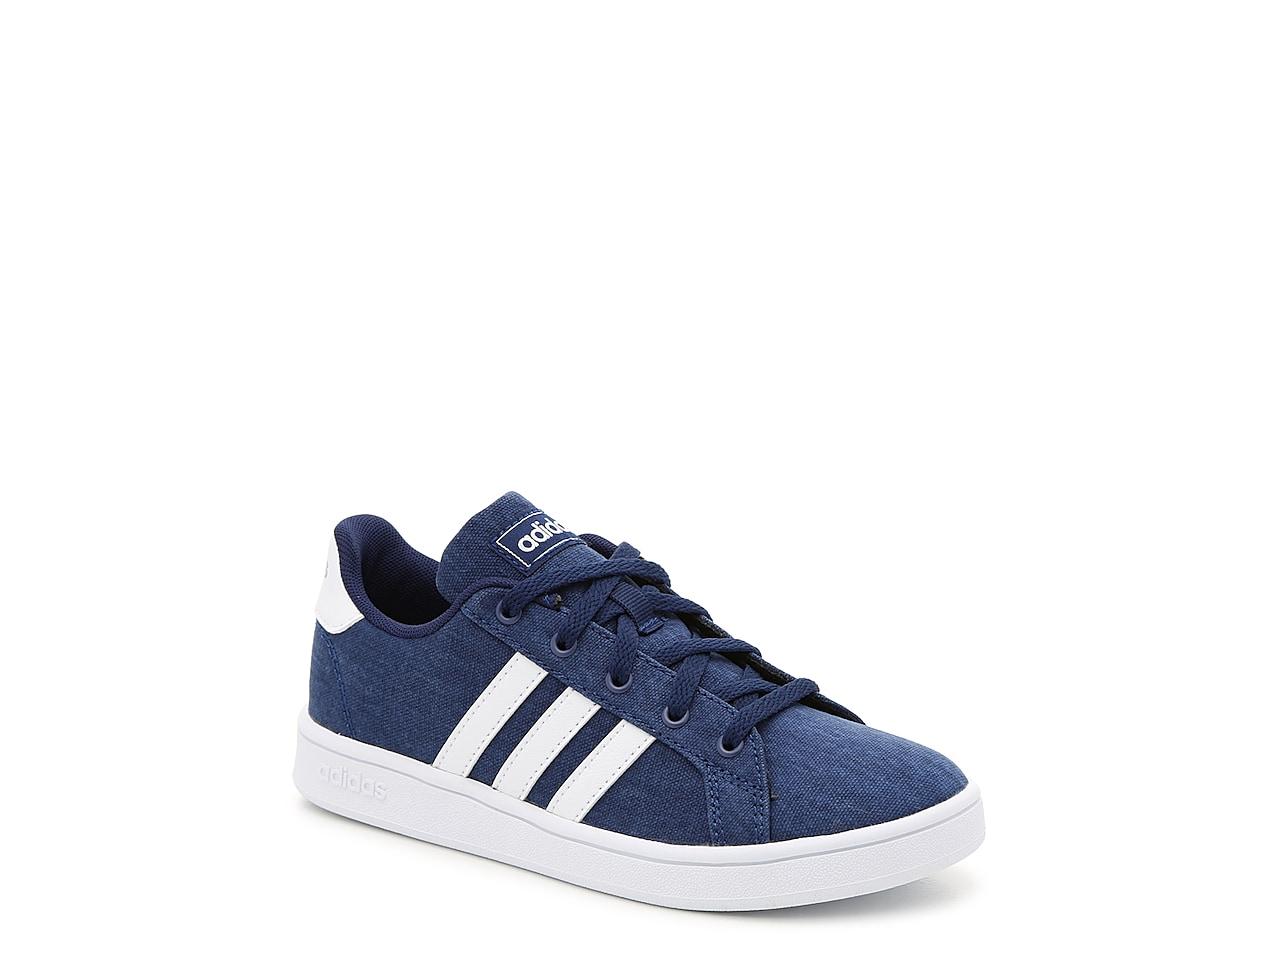 Adidas Kids: GRAND COURT SNEAKER! .98 (REG: ) at DSW!